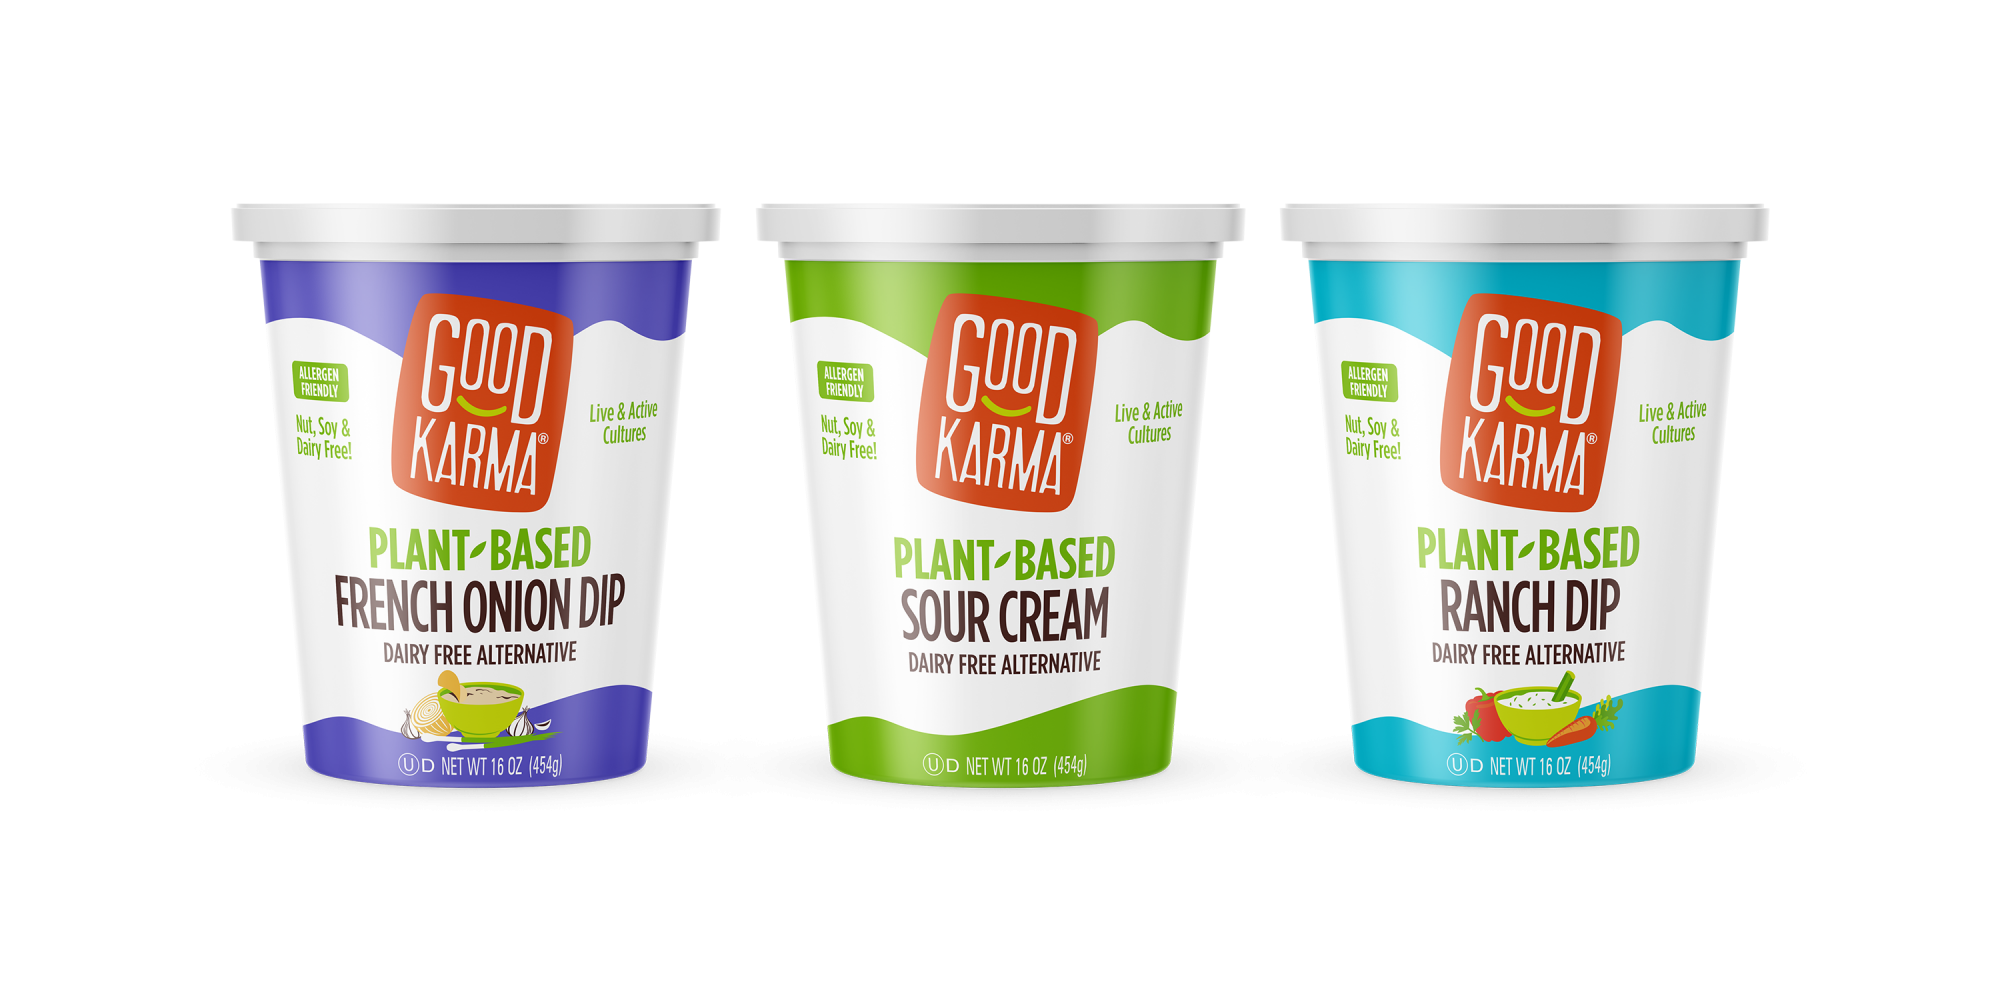 Good Karma Plant-Based Sour Cream + Dips